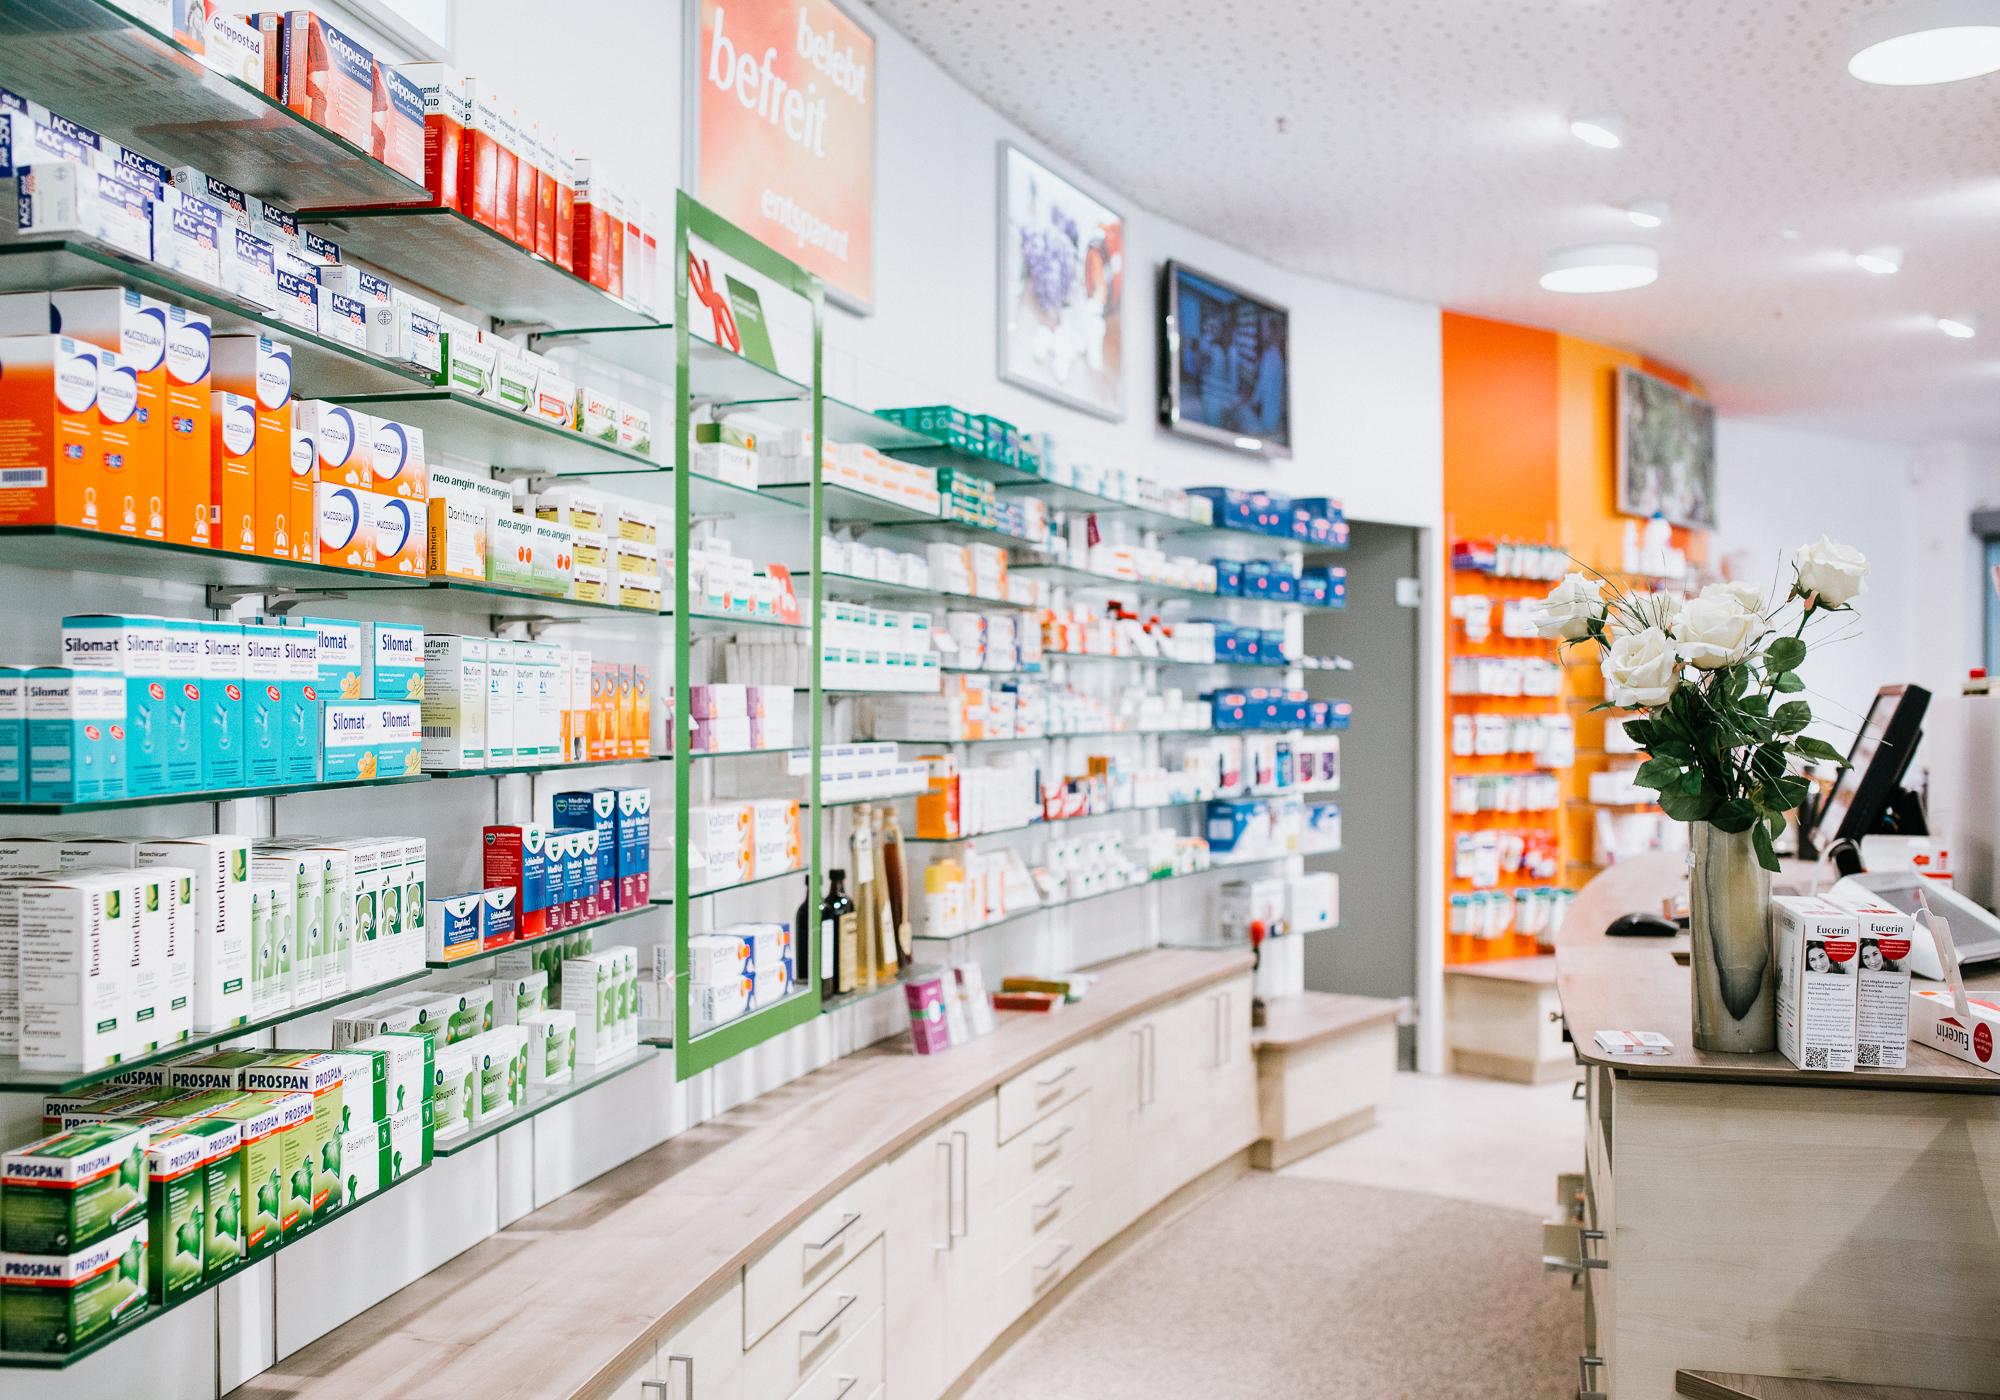 Apotheke St Ulrich in Peißenberg Medikamente, Auslage